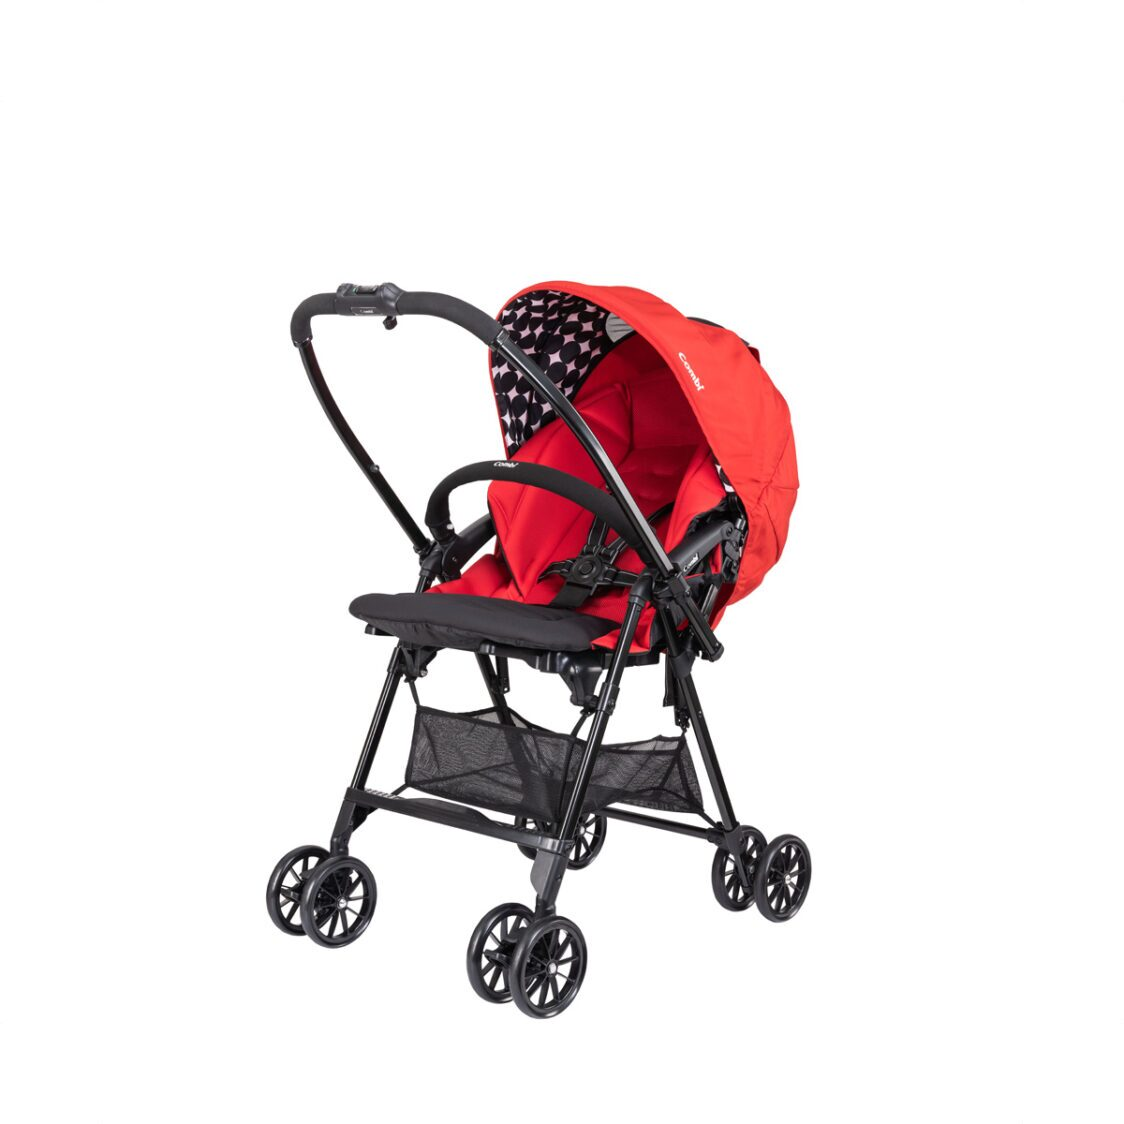 Combi Neyo Plus Red Stroller 148 Months 48KG